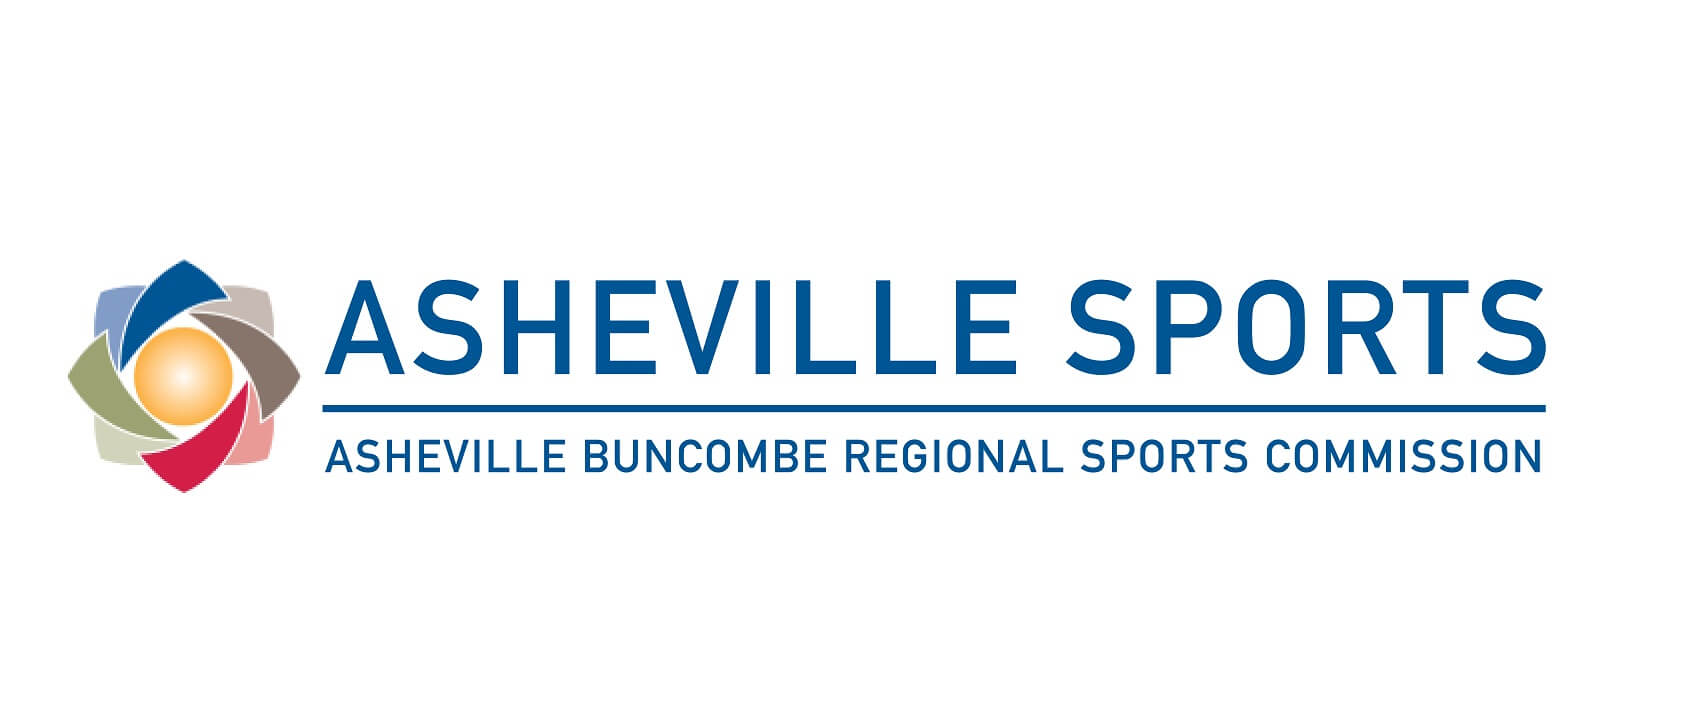 Asheville Buncombe Regional Sports Commission